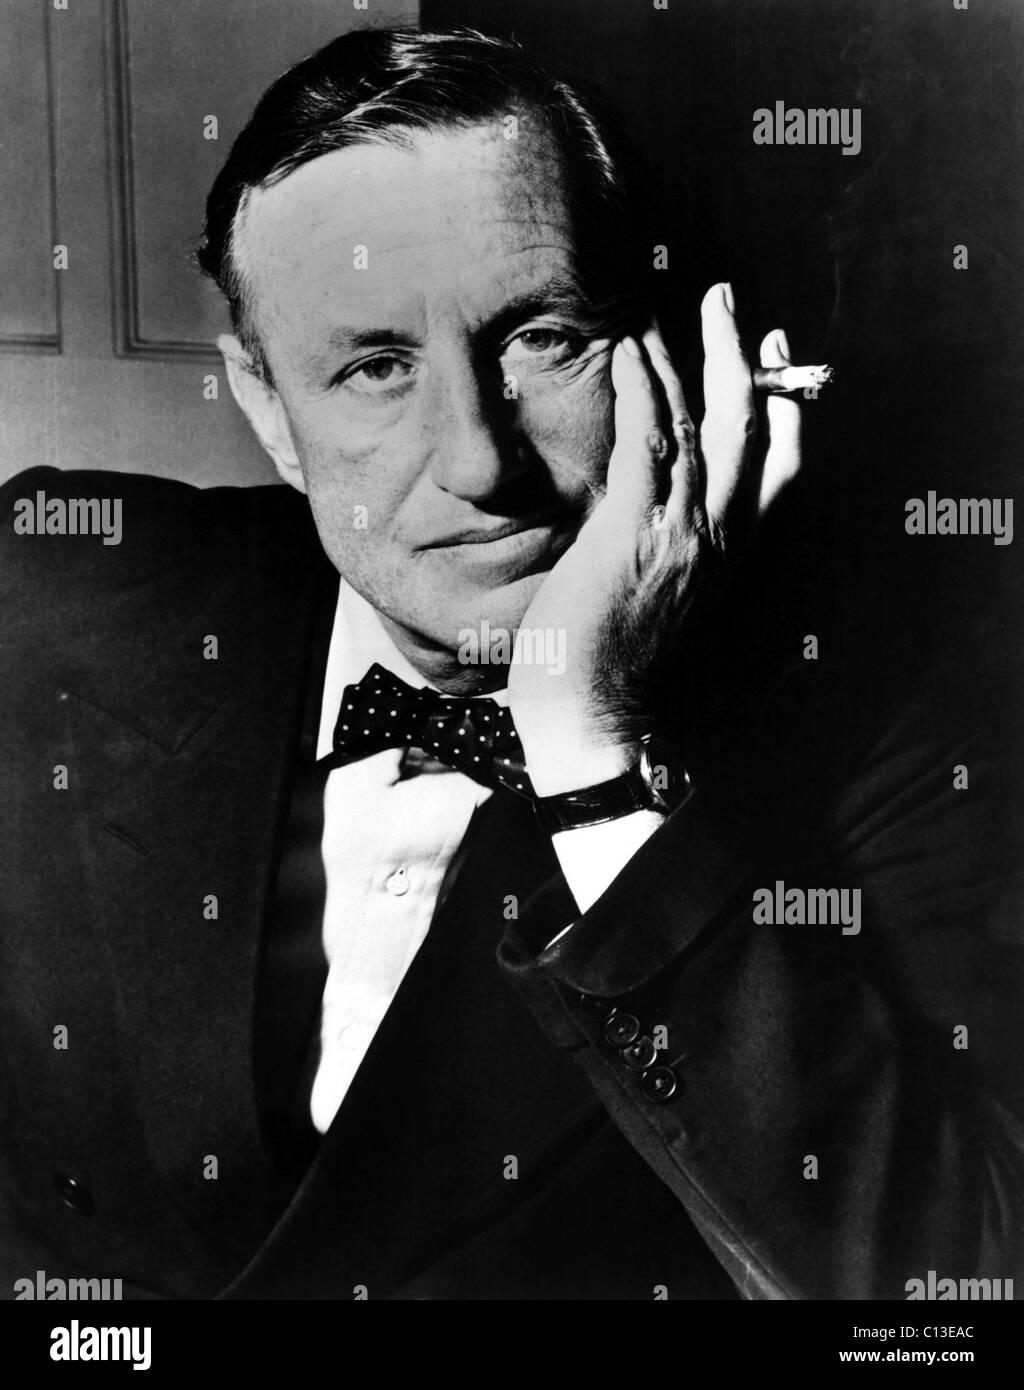 Author IAN FLEMING, creator of James Bond - Stock Image